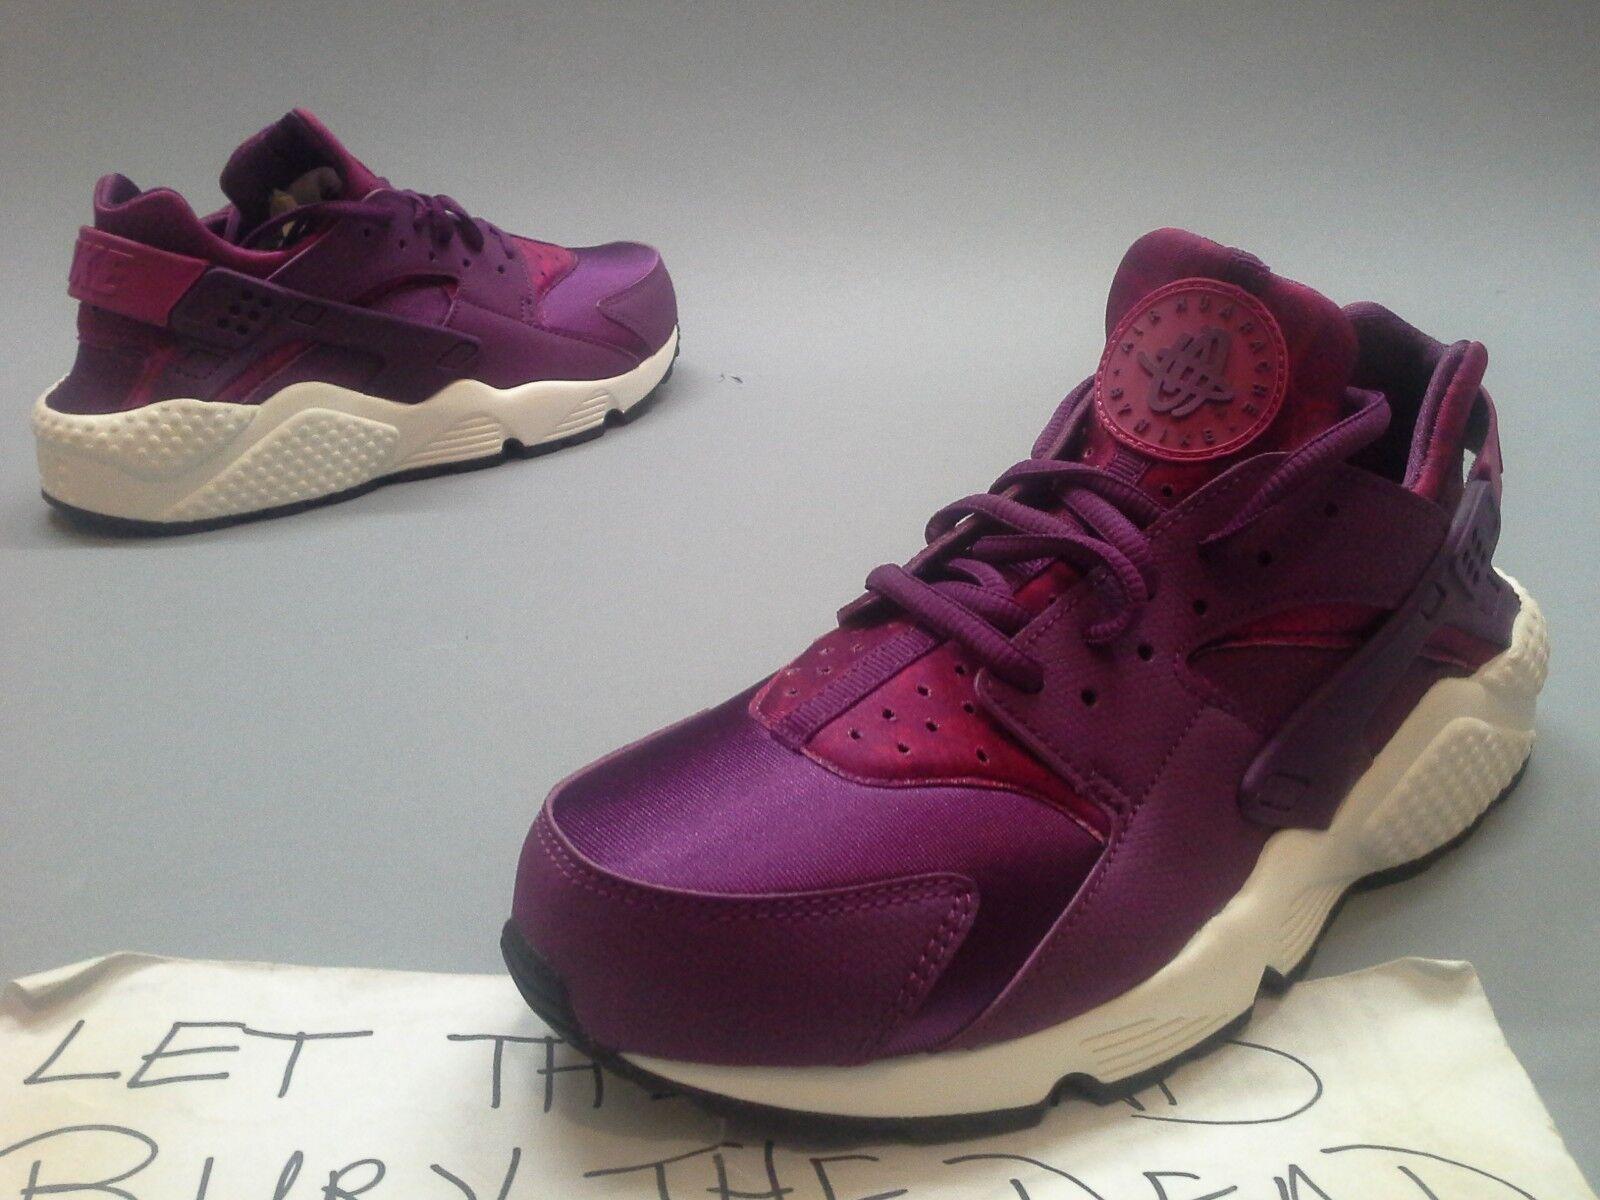 New Wmns Nike Huarache Run Print Mulberry 725076-500 Maroon Burgundy White